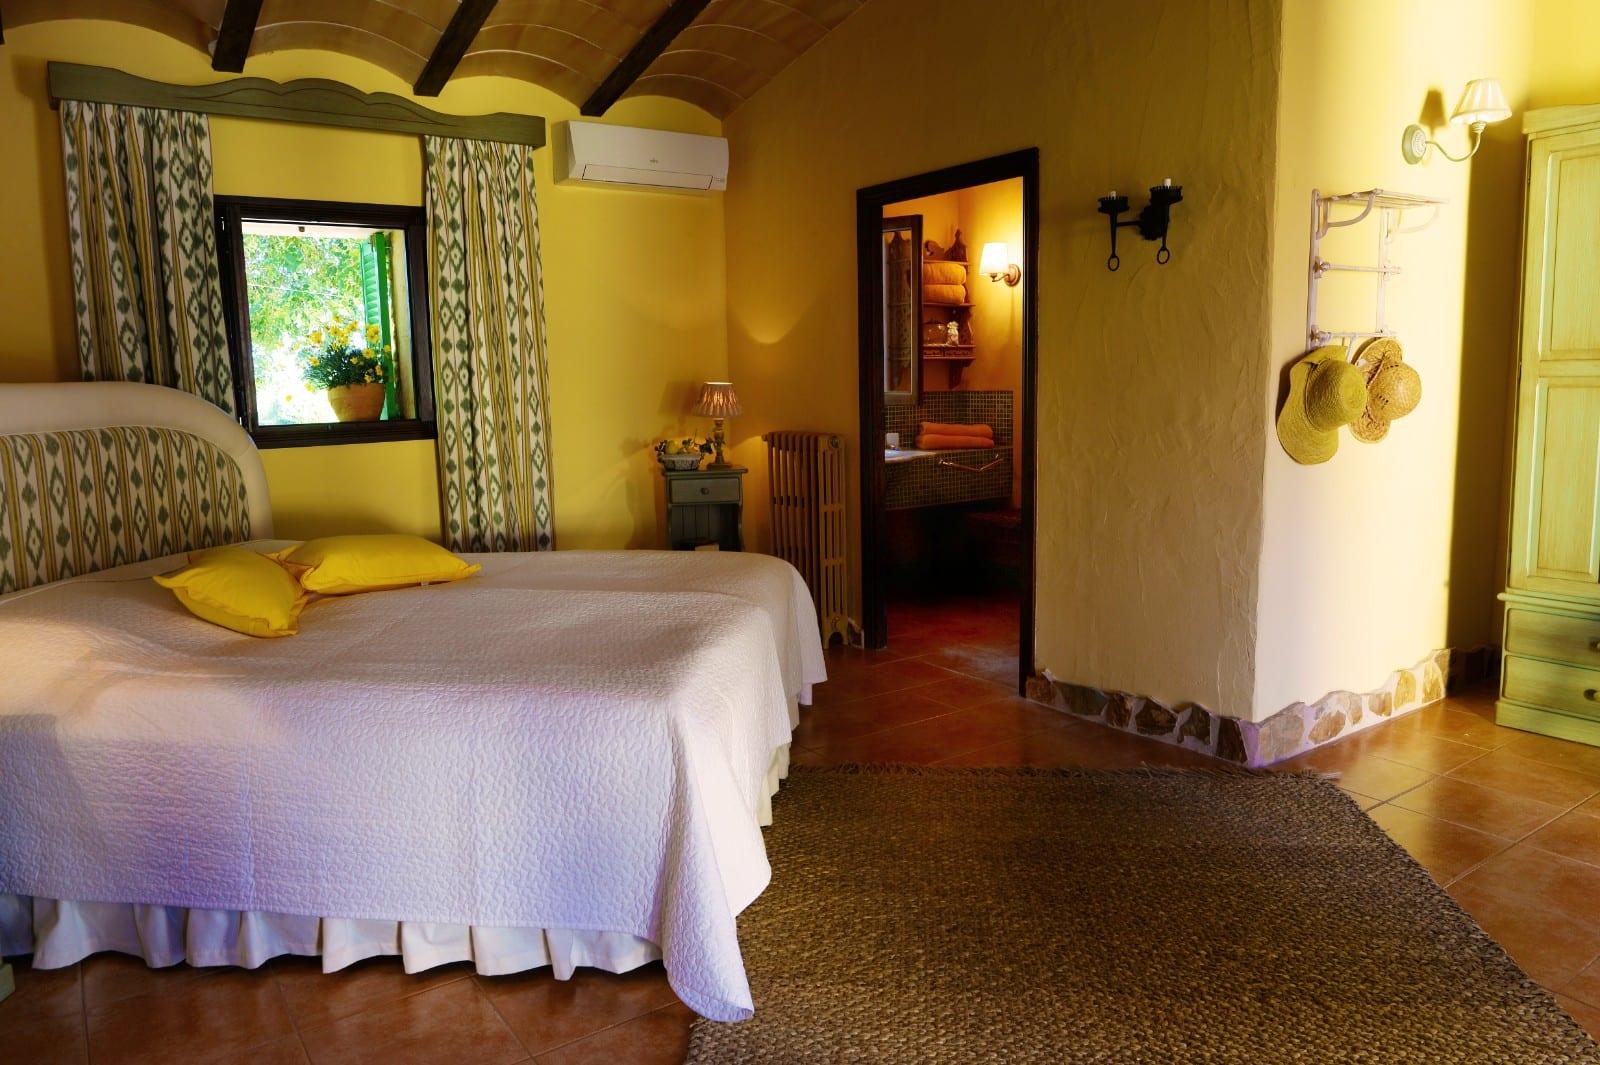 ISLA 01 Finca Santanyi Bedroom 2